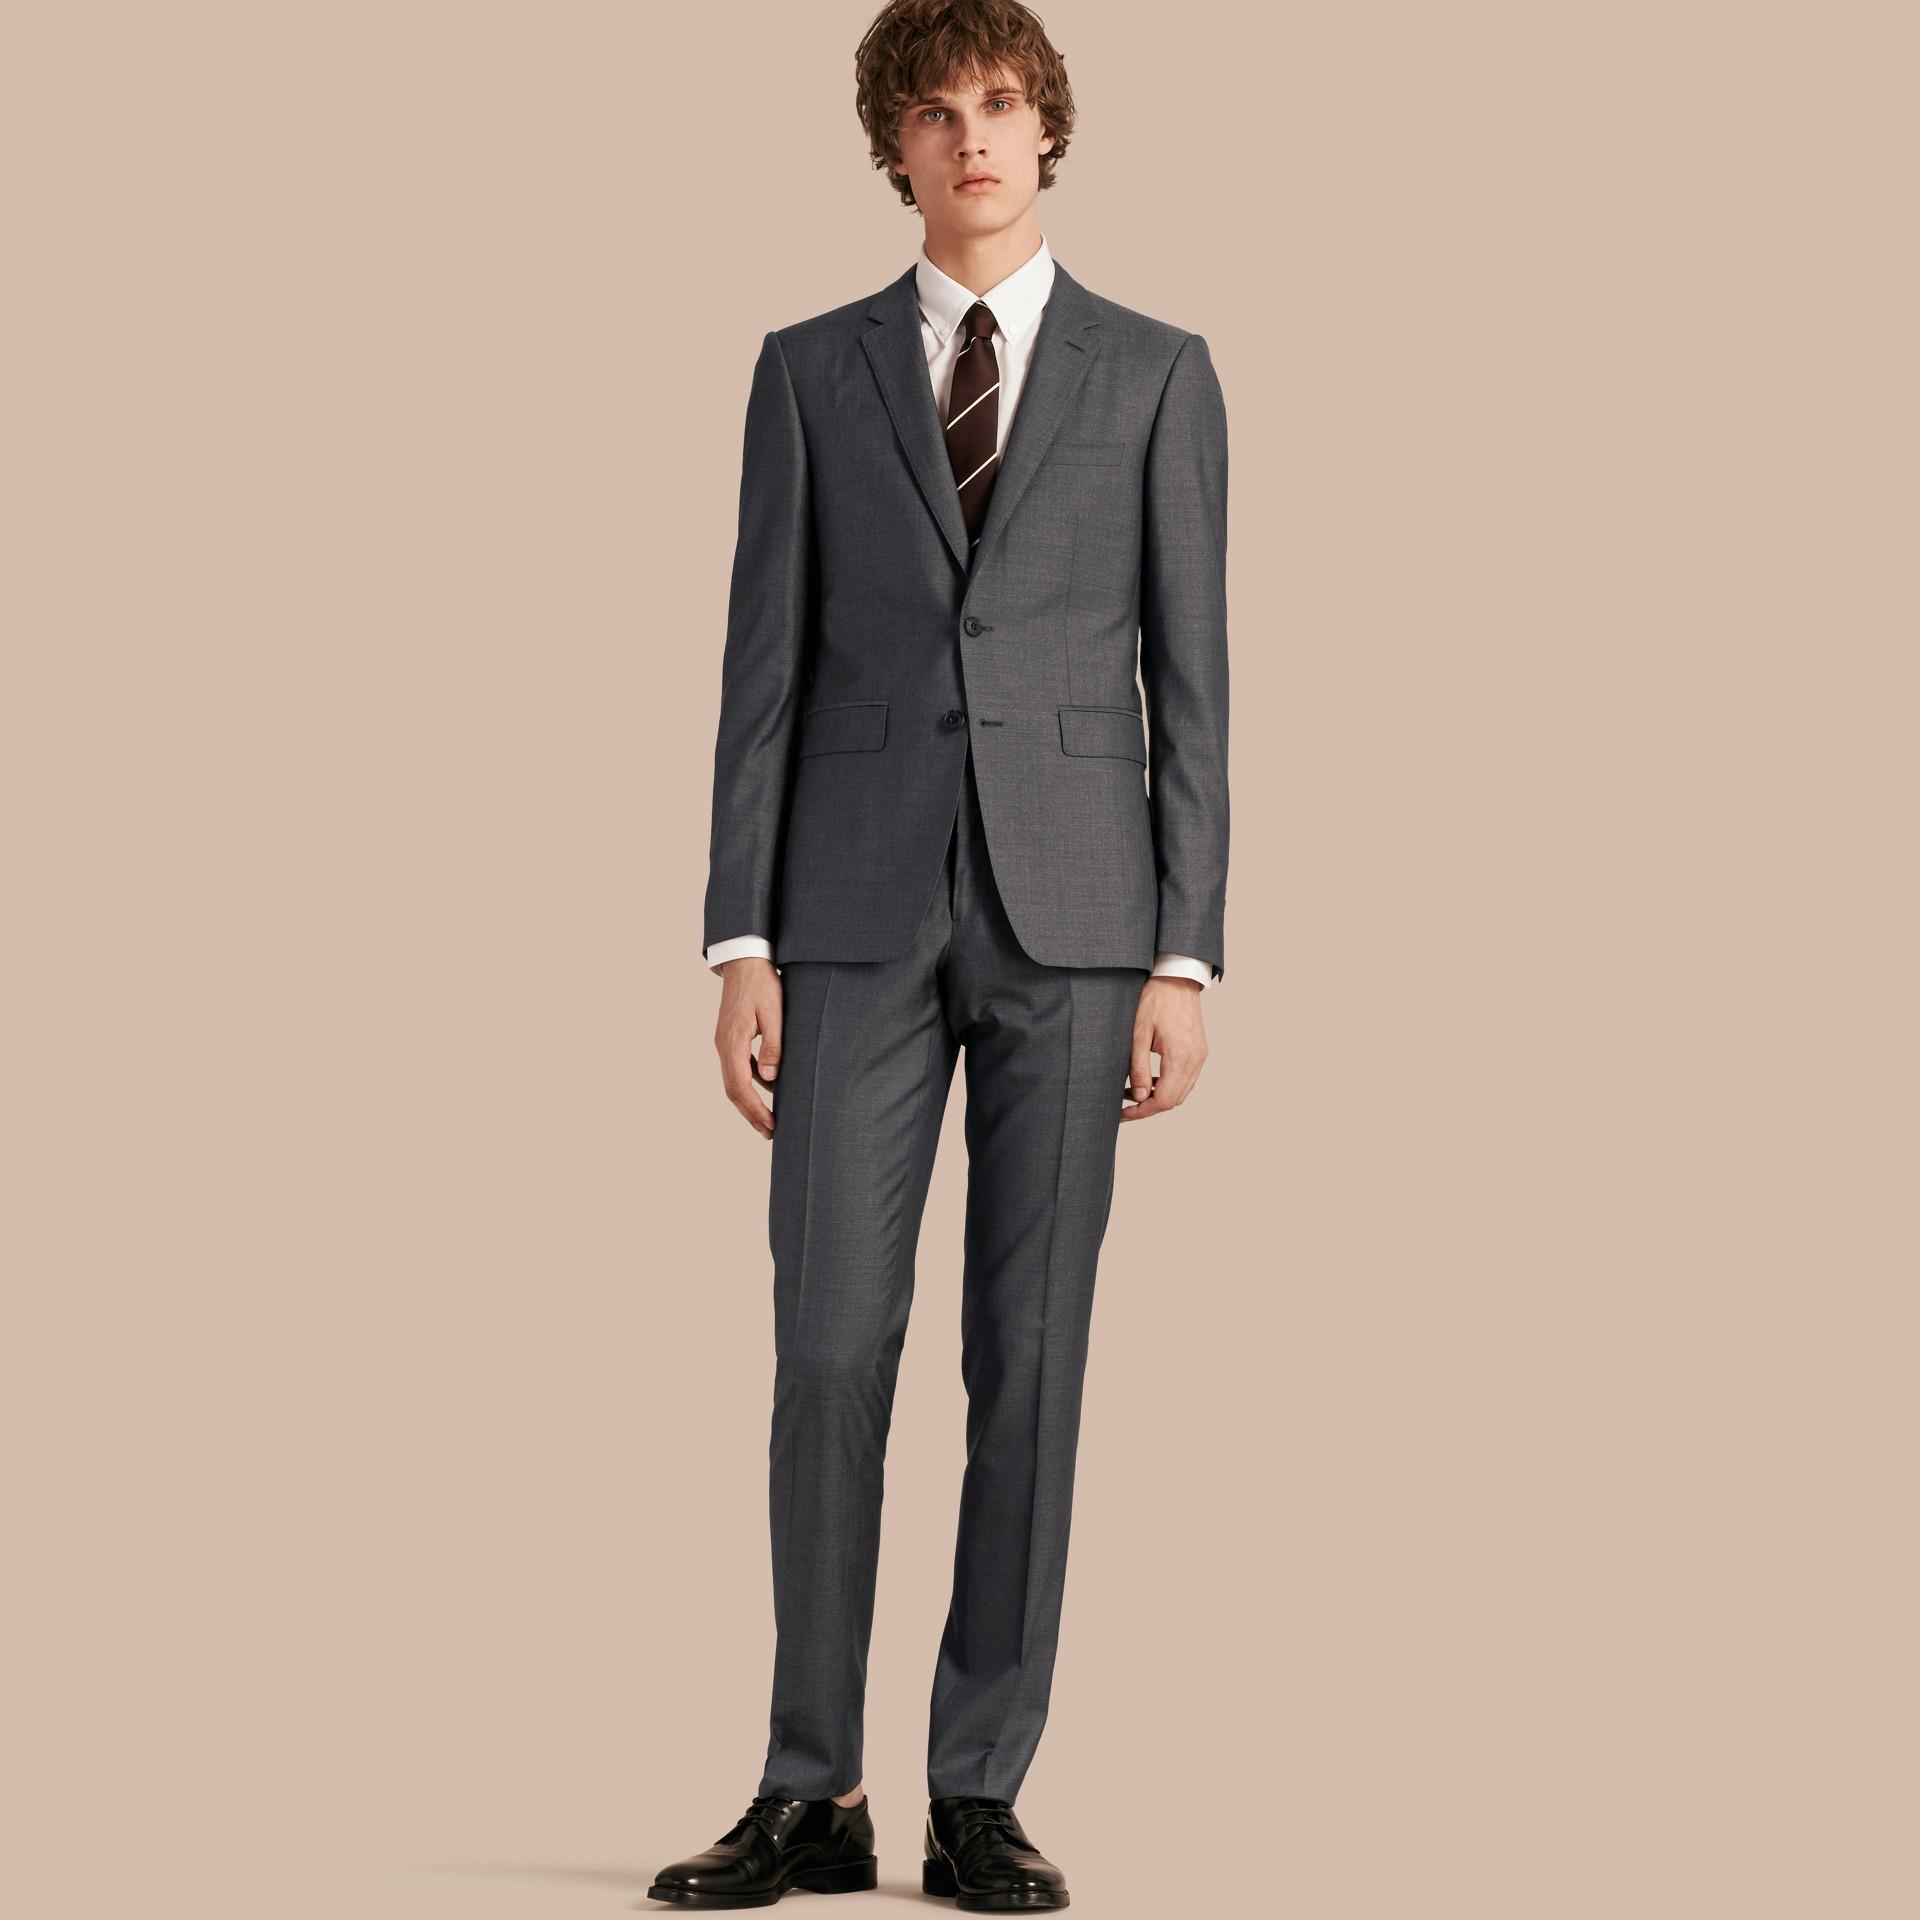 Темно-серый меланж Узкий костюм из шерсти и шелка - изображение 1